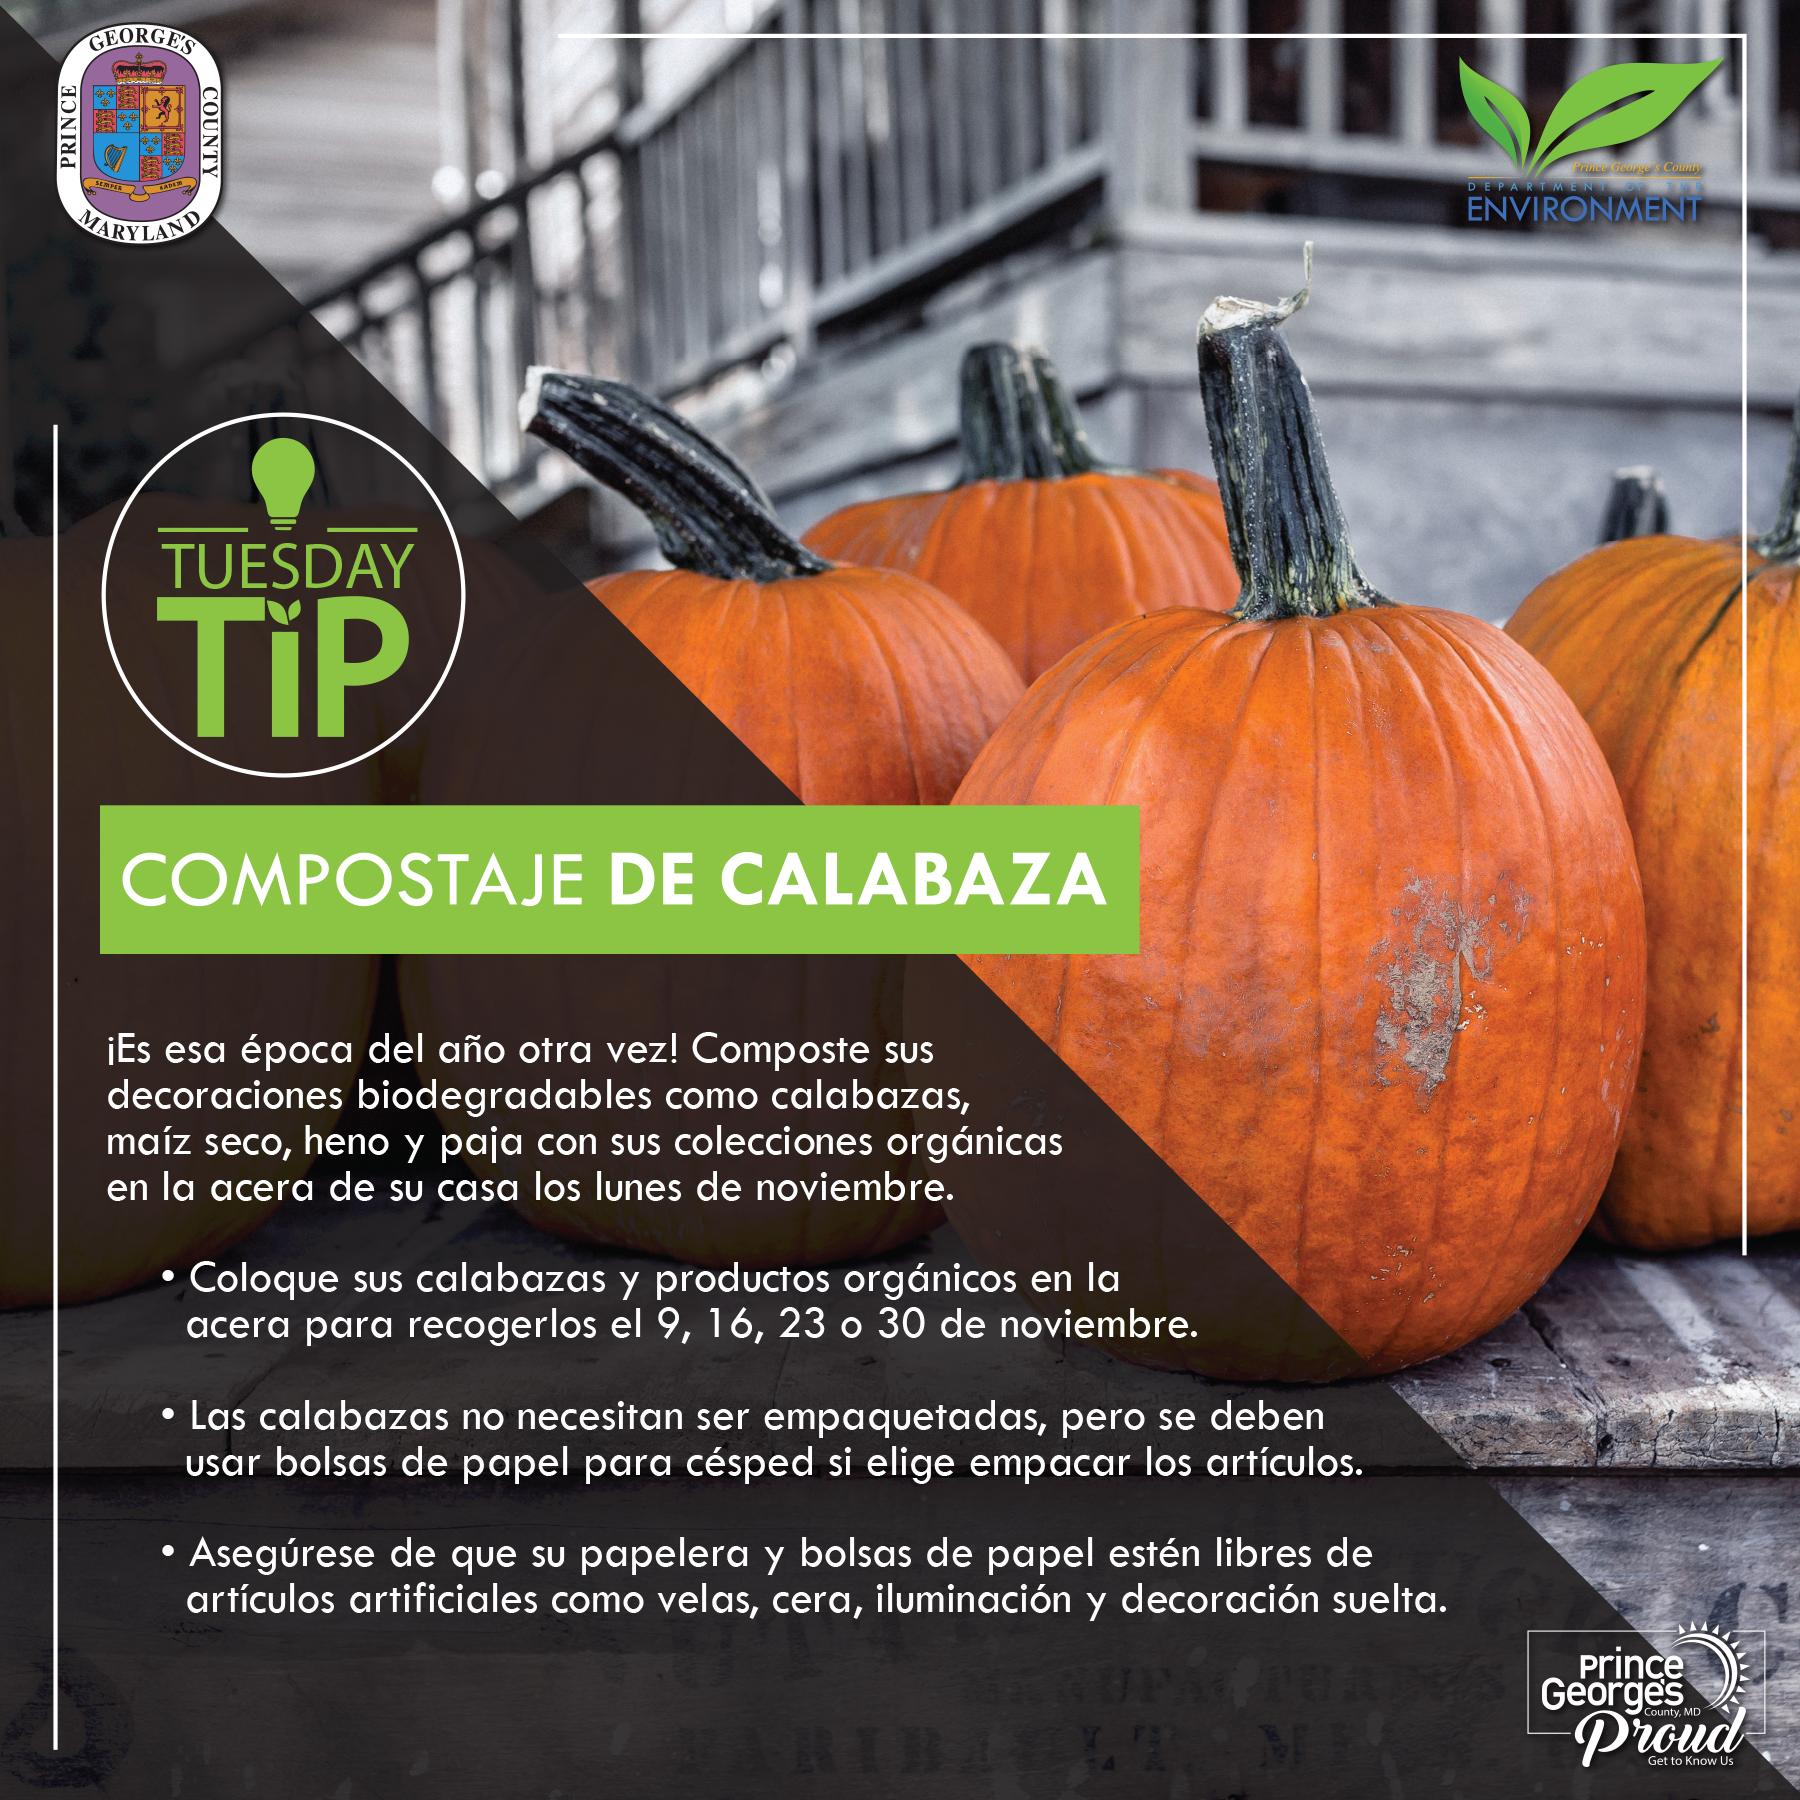 Tues Tip 11.3.20 Pumpkin Composting sp